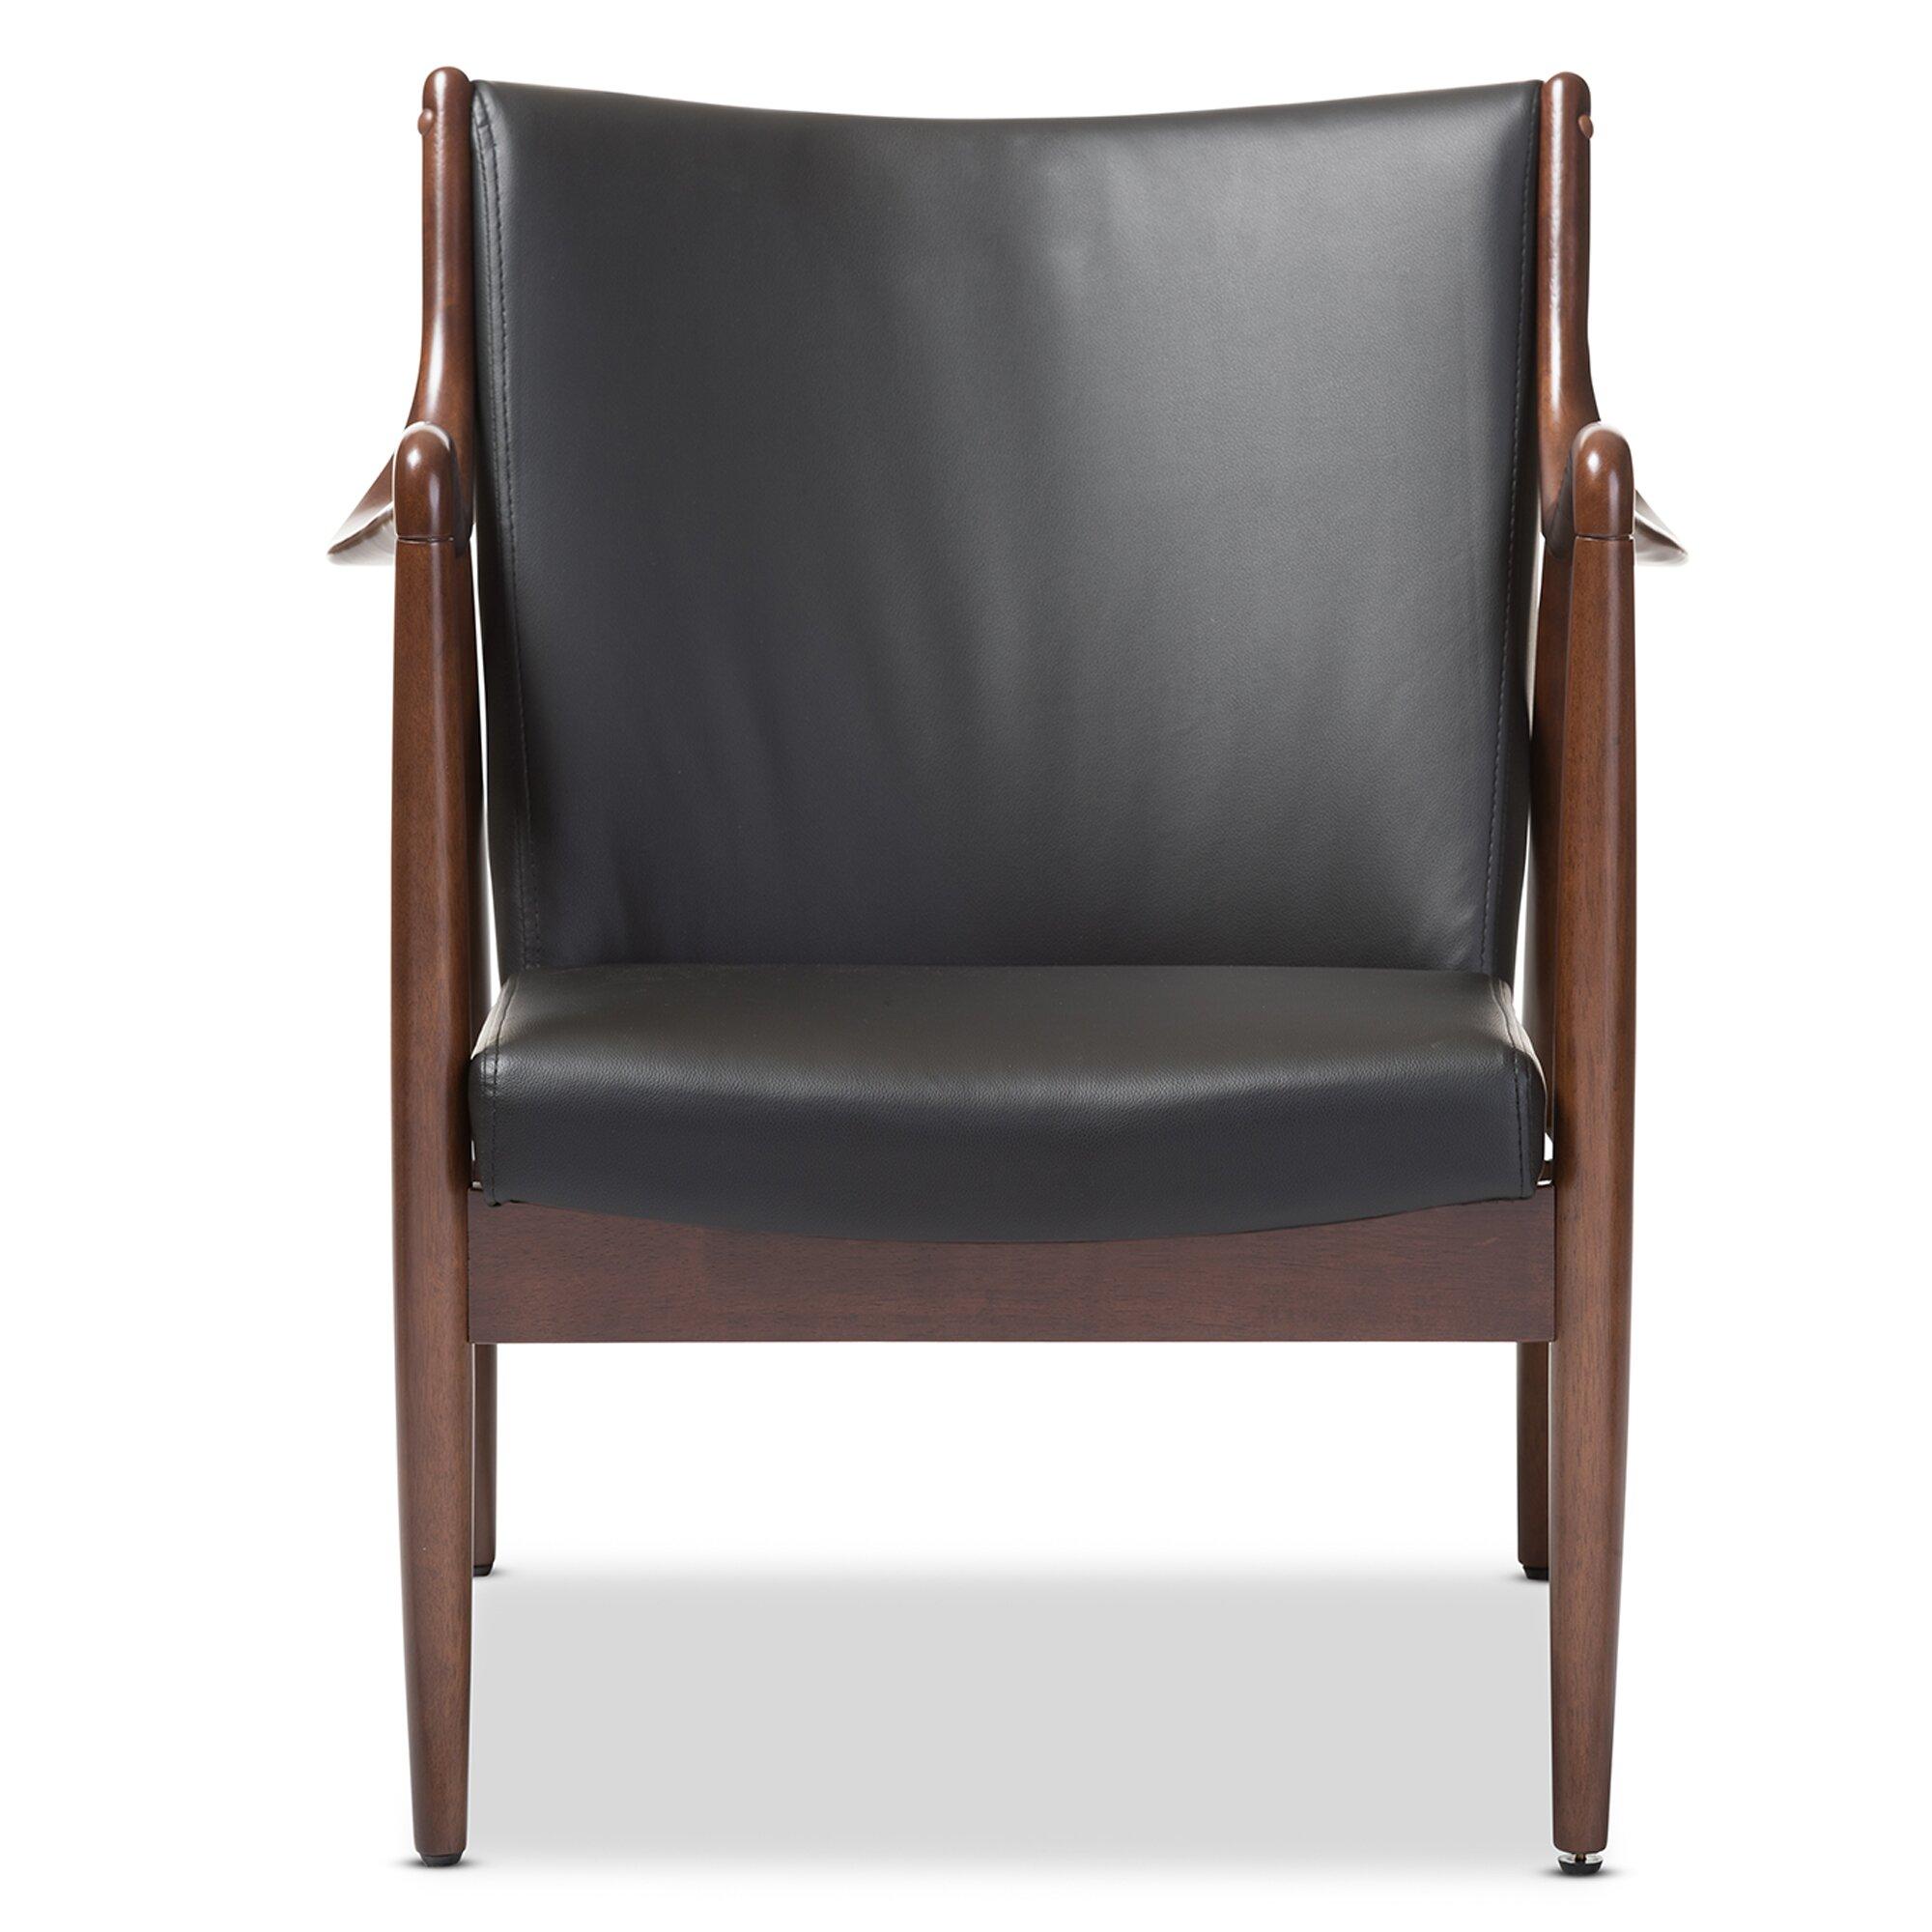 Wholesale Interiors Shakespeare Leisure Lounge Chair